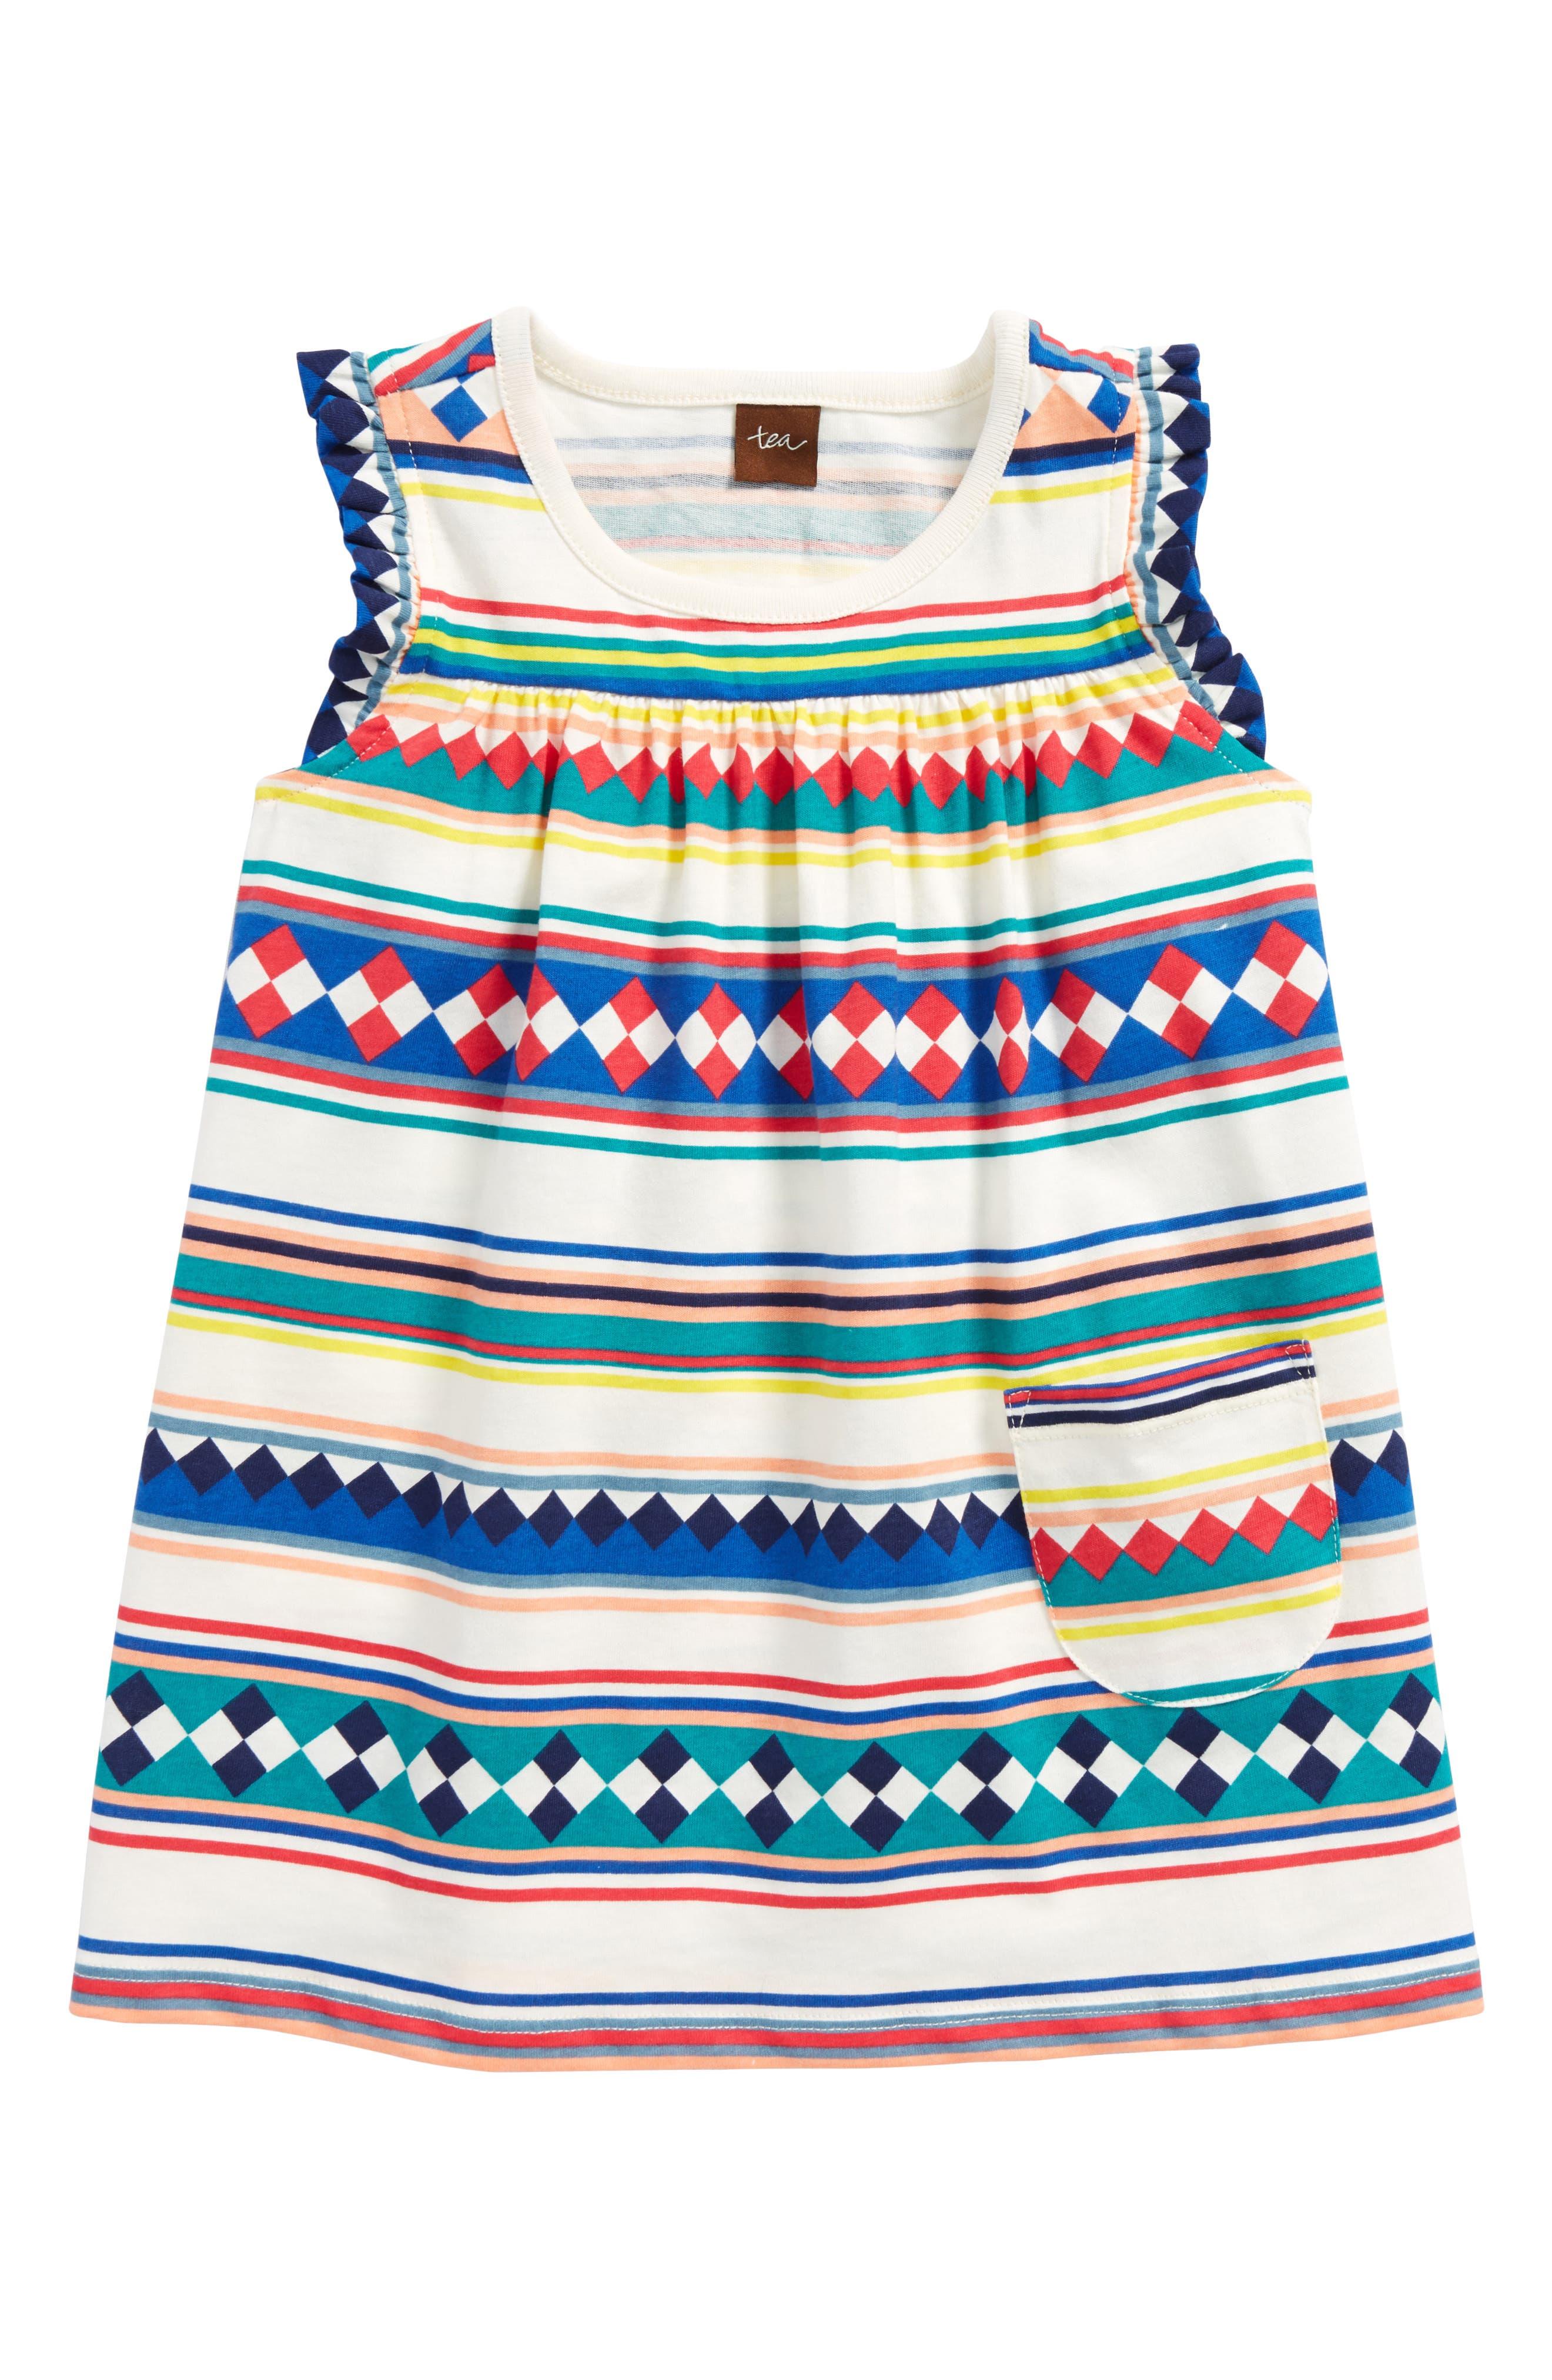 Mighty Mini Dress,                             Main thumbnail 1, color,                             Seminole Patchwork Stripe